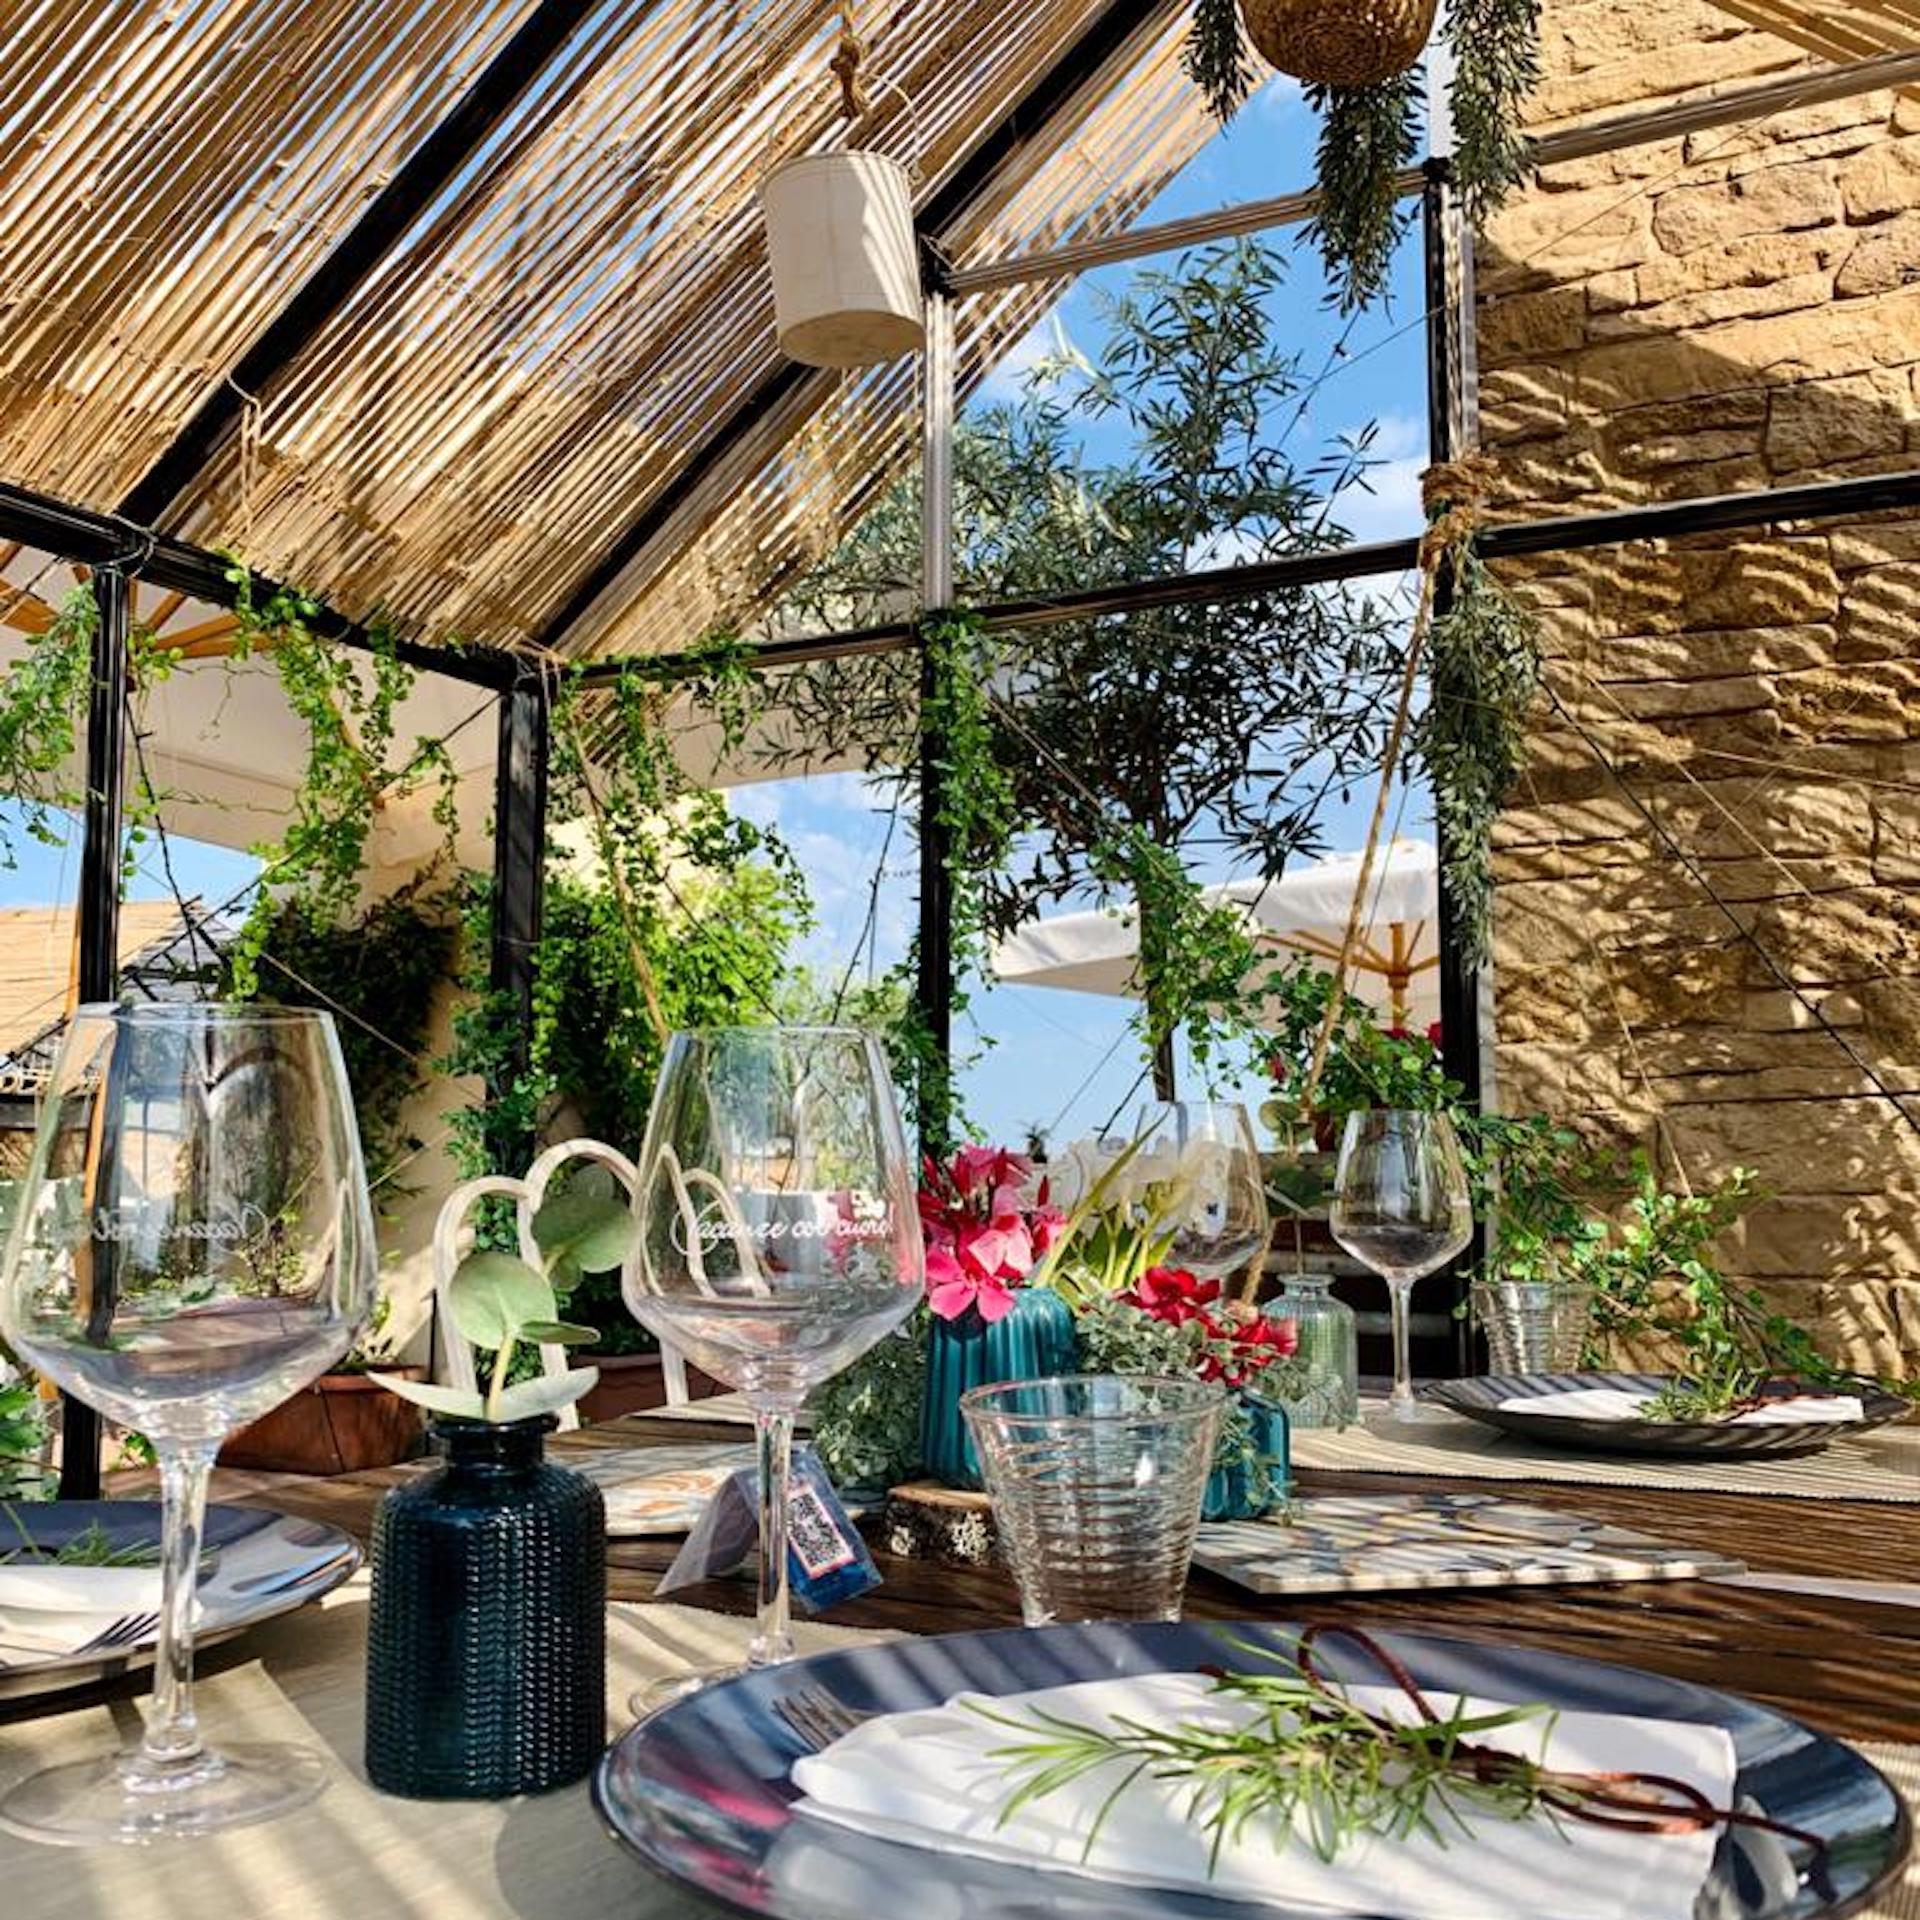 Roof Garden | The new terrance on the restaurant roof looks like a garden